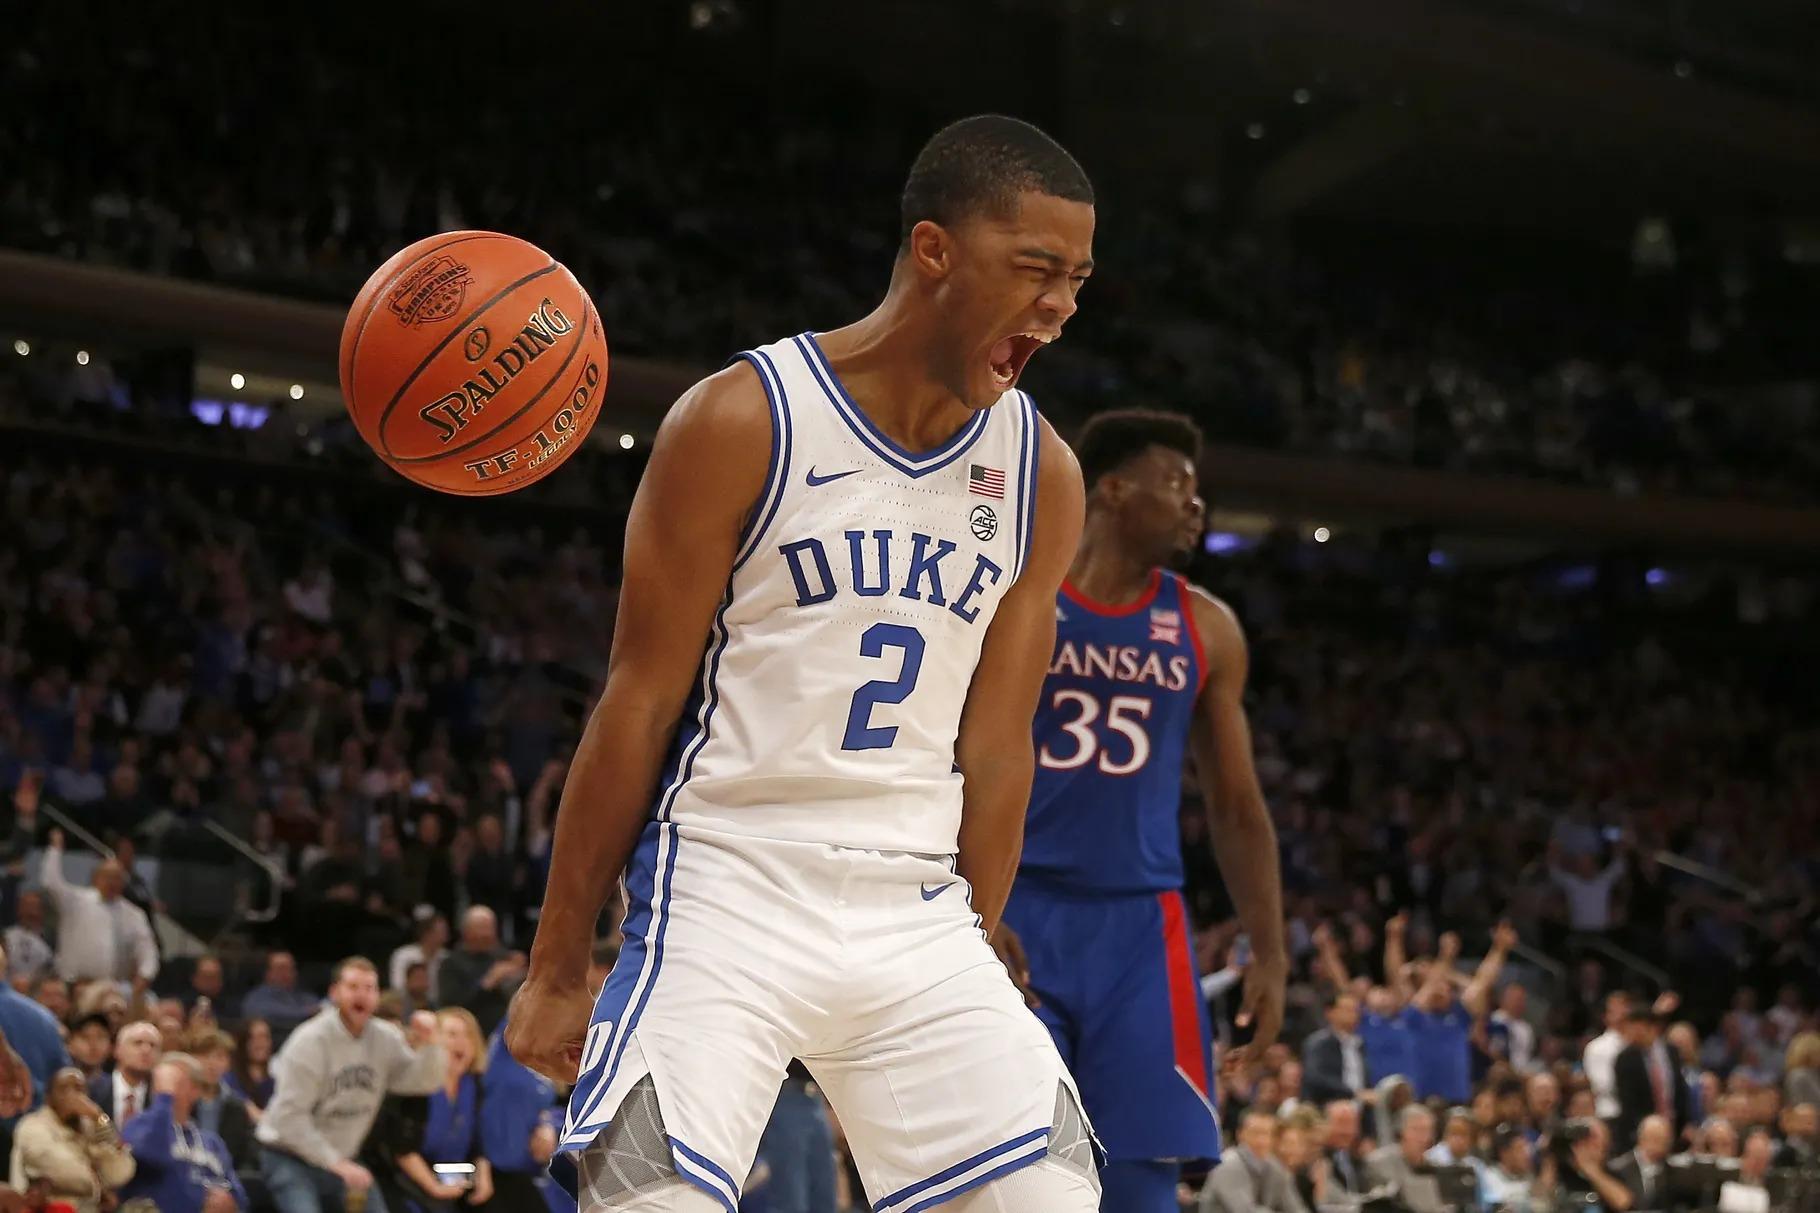 Duke player